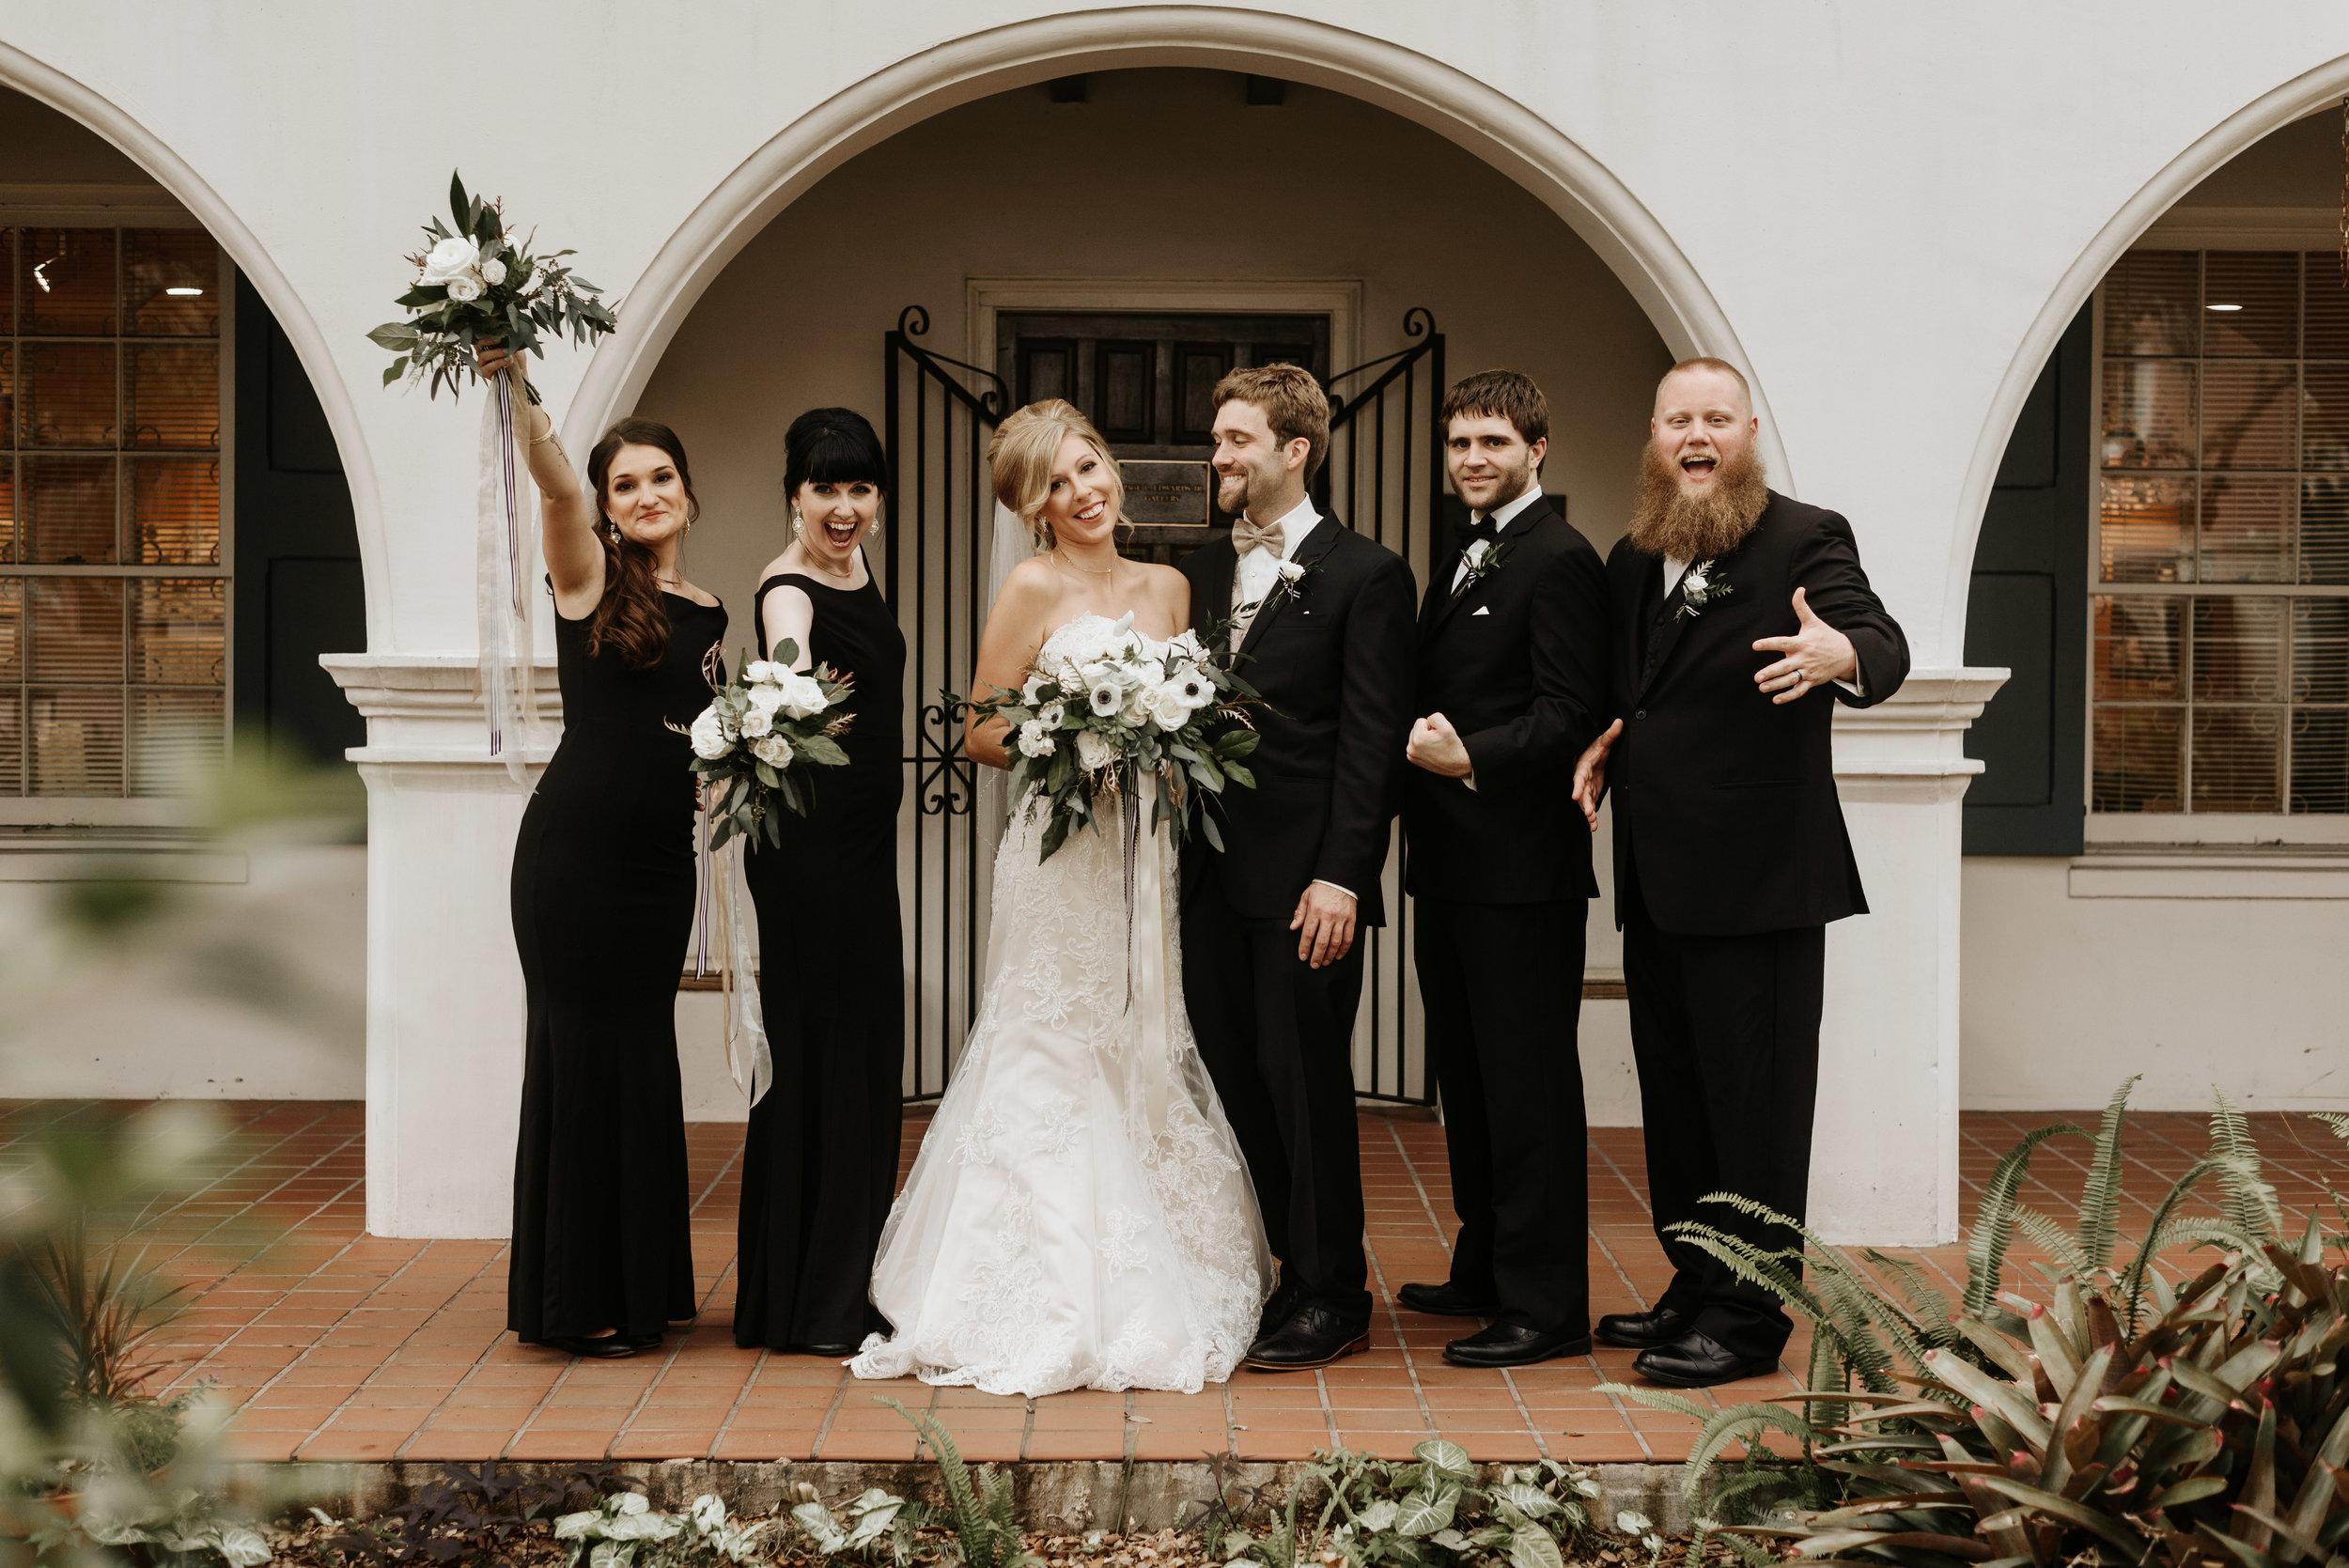 Mandy-Brad-Wedding-Previews-2549.jpg